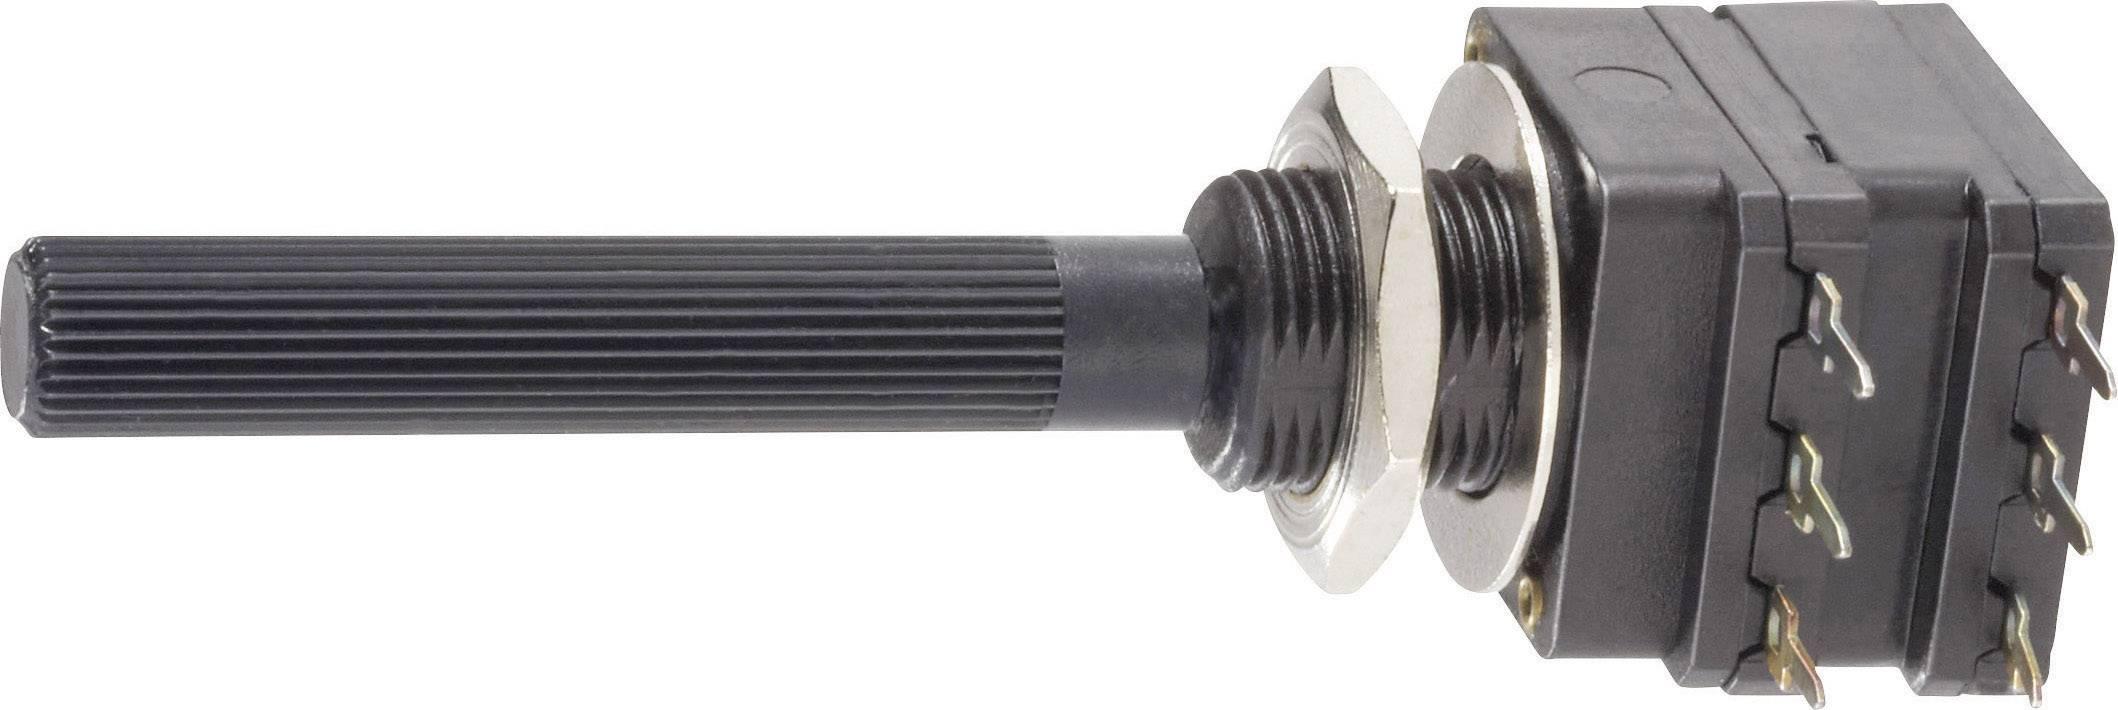 Otočný potenciometer stereo Piher PC16DH-10IP06105B2020MTA PC16DH-10IP06105B2020MTA, 0.1 W, 1 MOhm, 1 ks